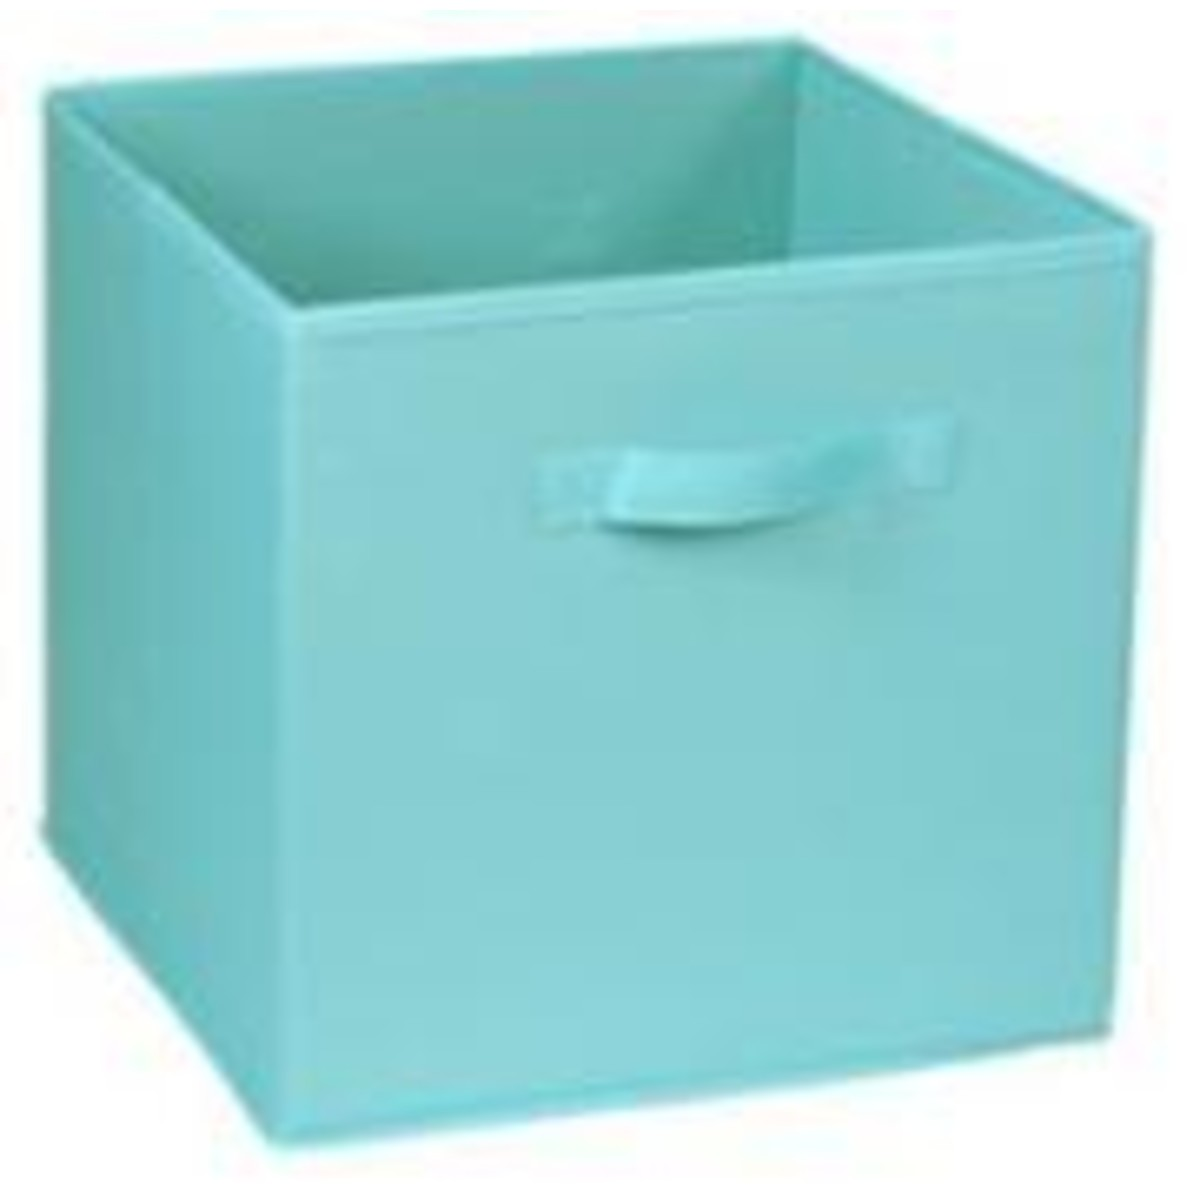 Короб для хранения 31x31x31 см полиэстер цвет голубой